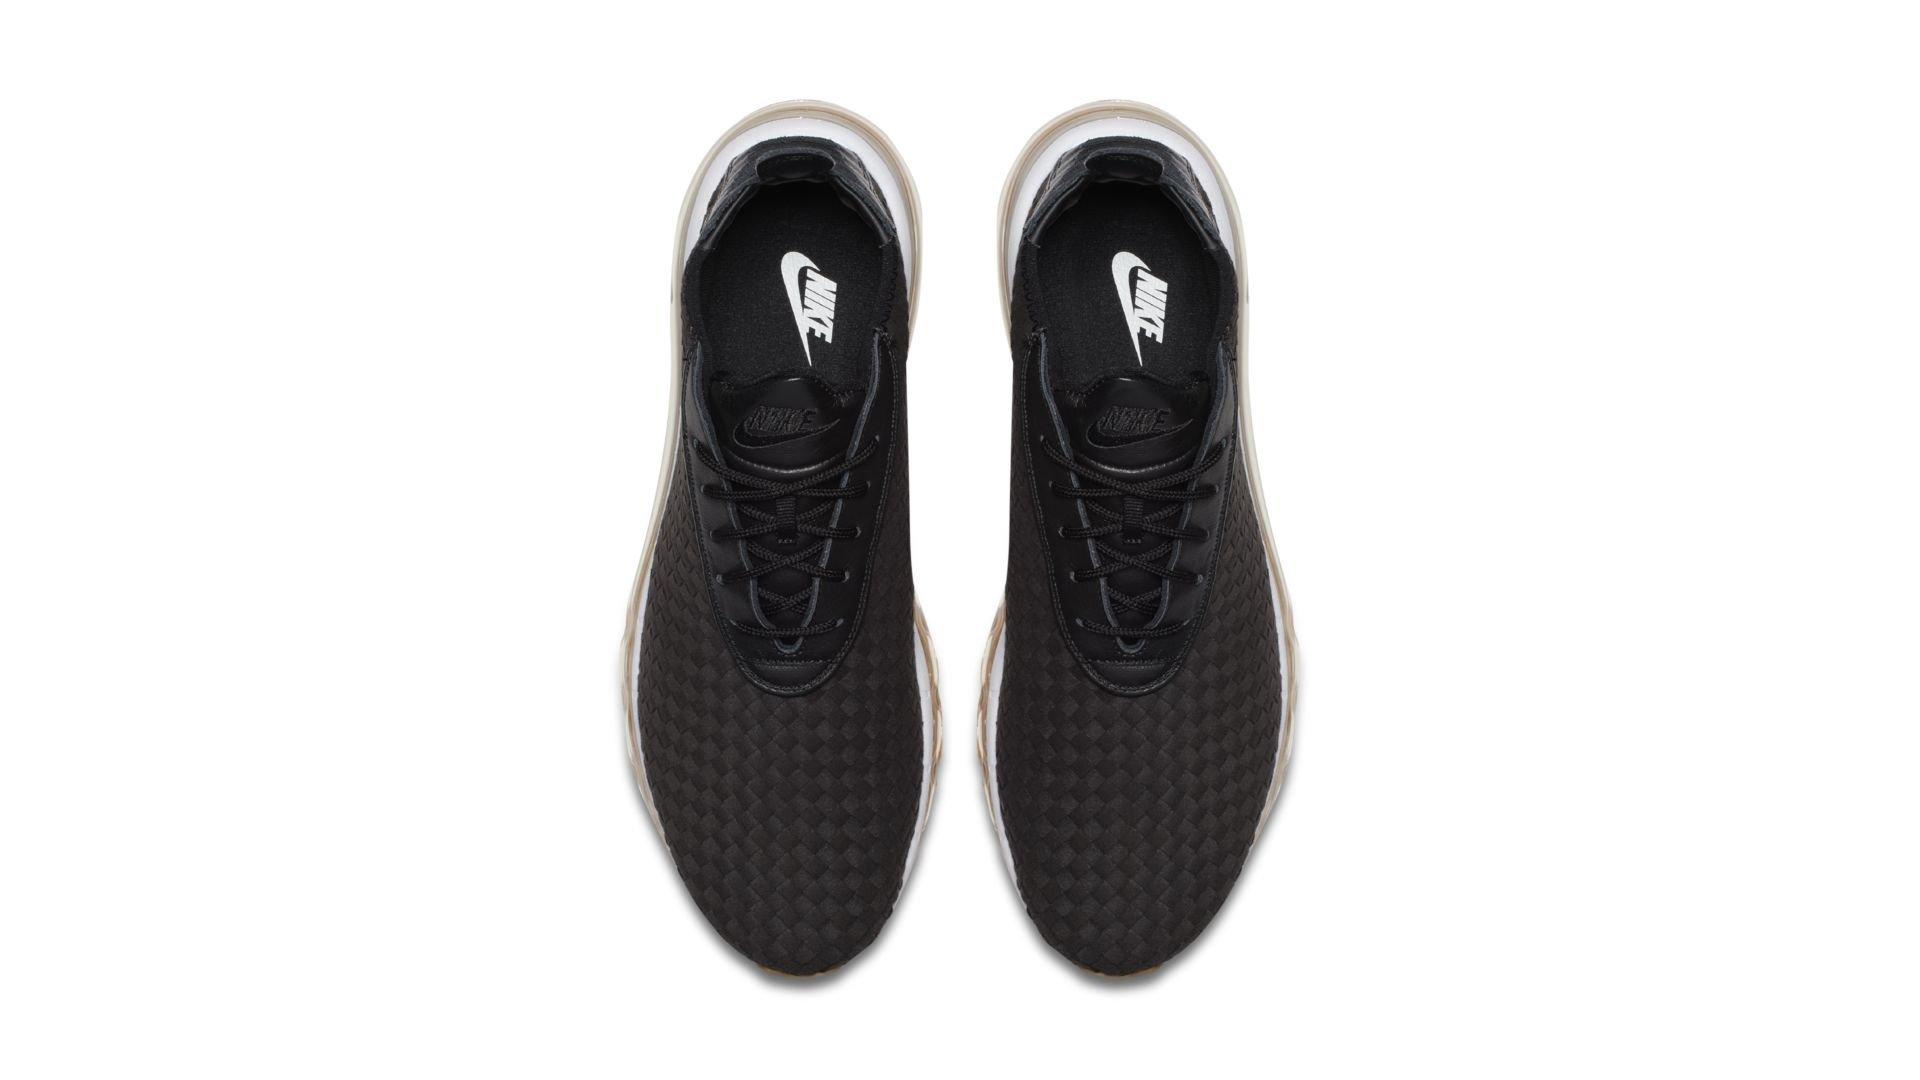 Nike Air Max Woven Boot 921854 003